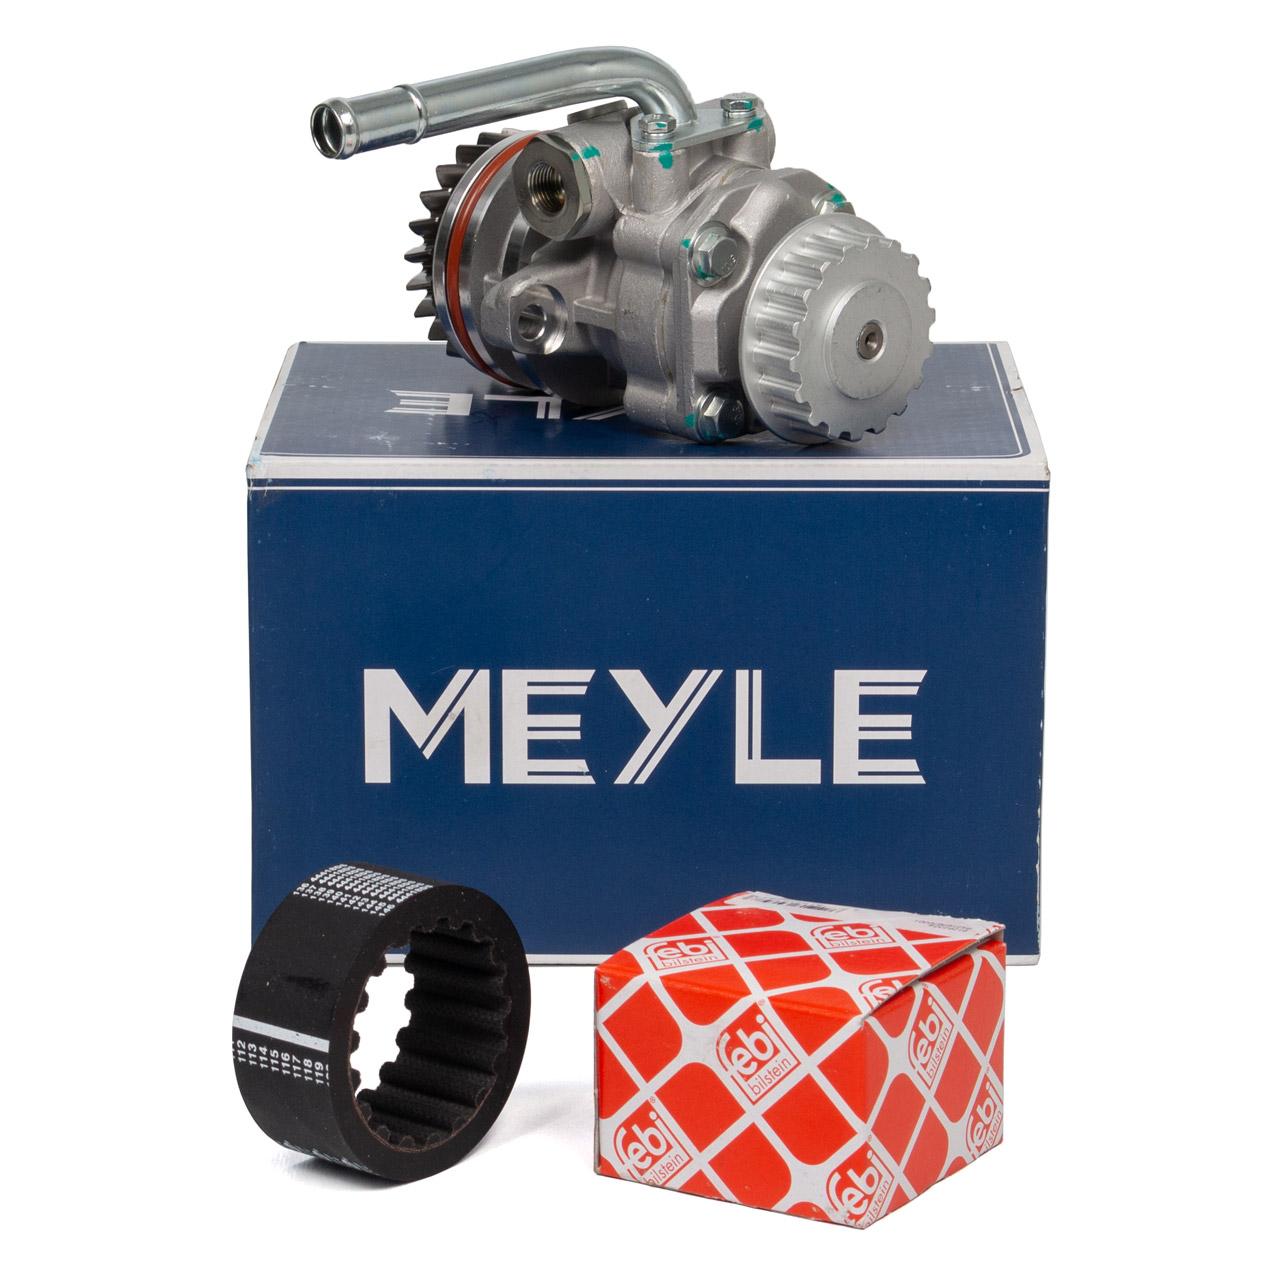 MEYLE Servopumpe Hydraulikpumpe + FEBI Kupplungsmuffe VW T5 Touareg 2.5 TDI